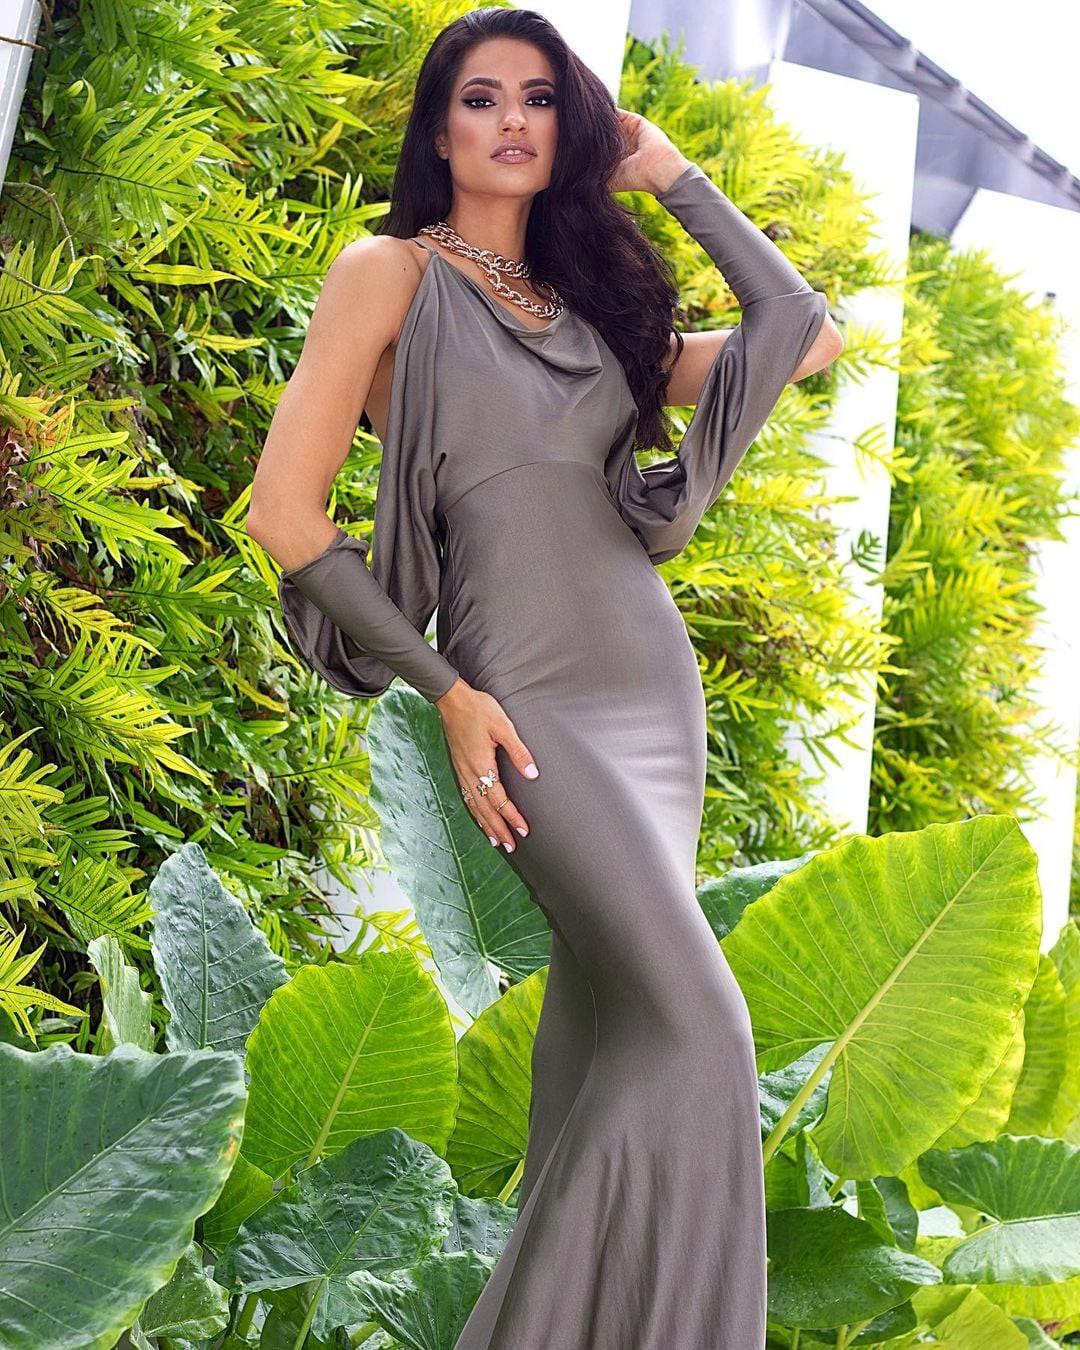 karla guilfu, miss supranational puerto rico 2020. - Página 2 Bss3cf10